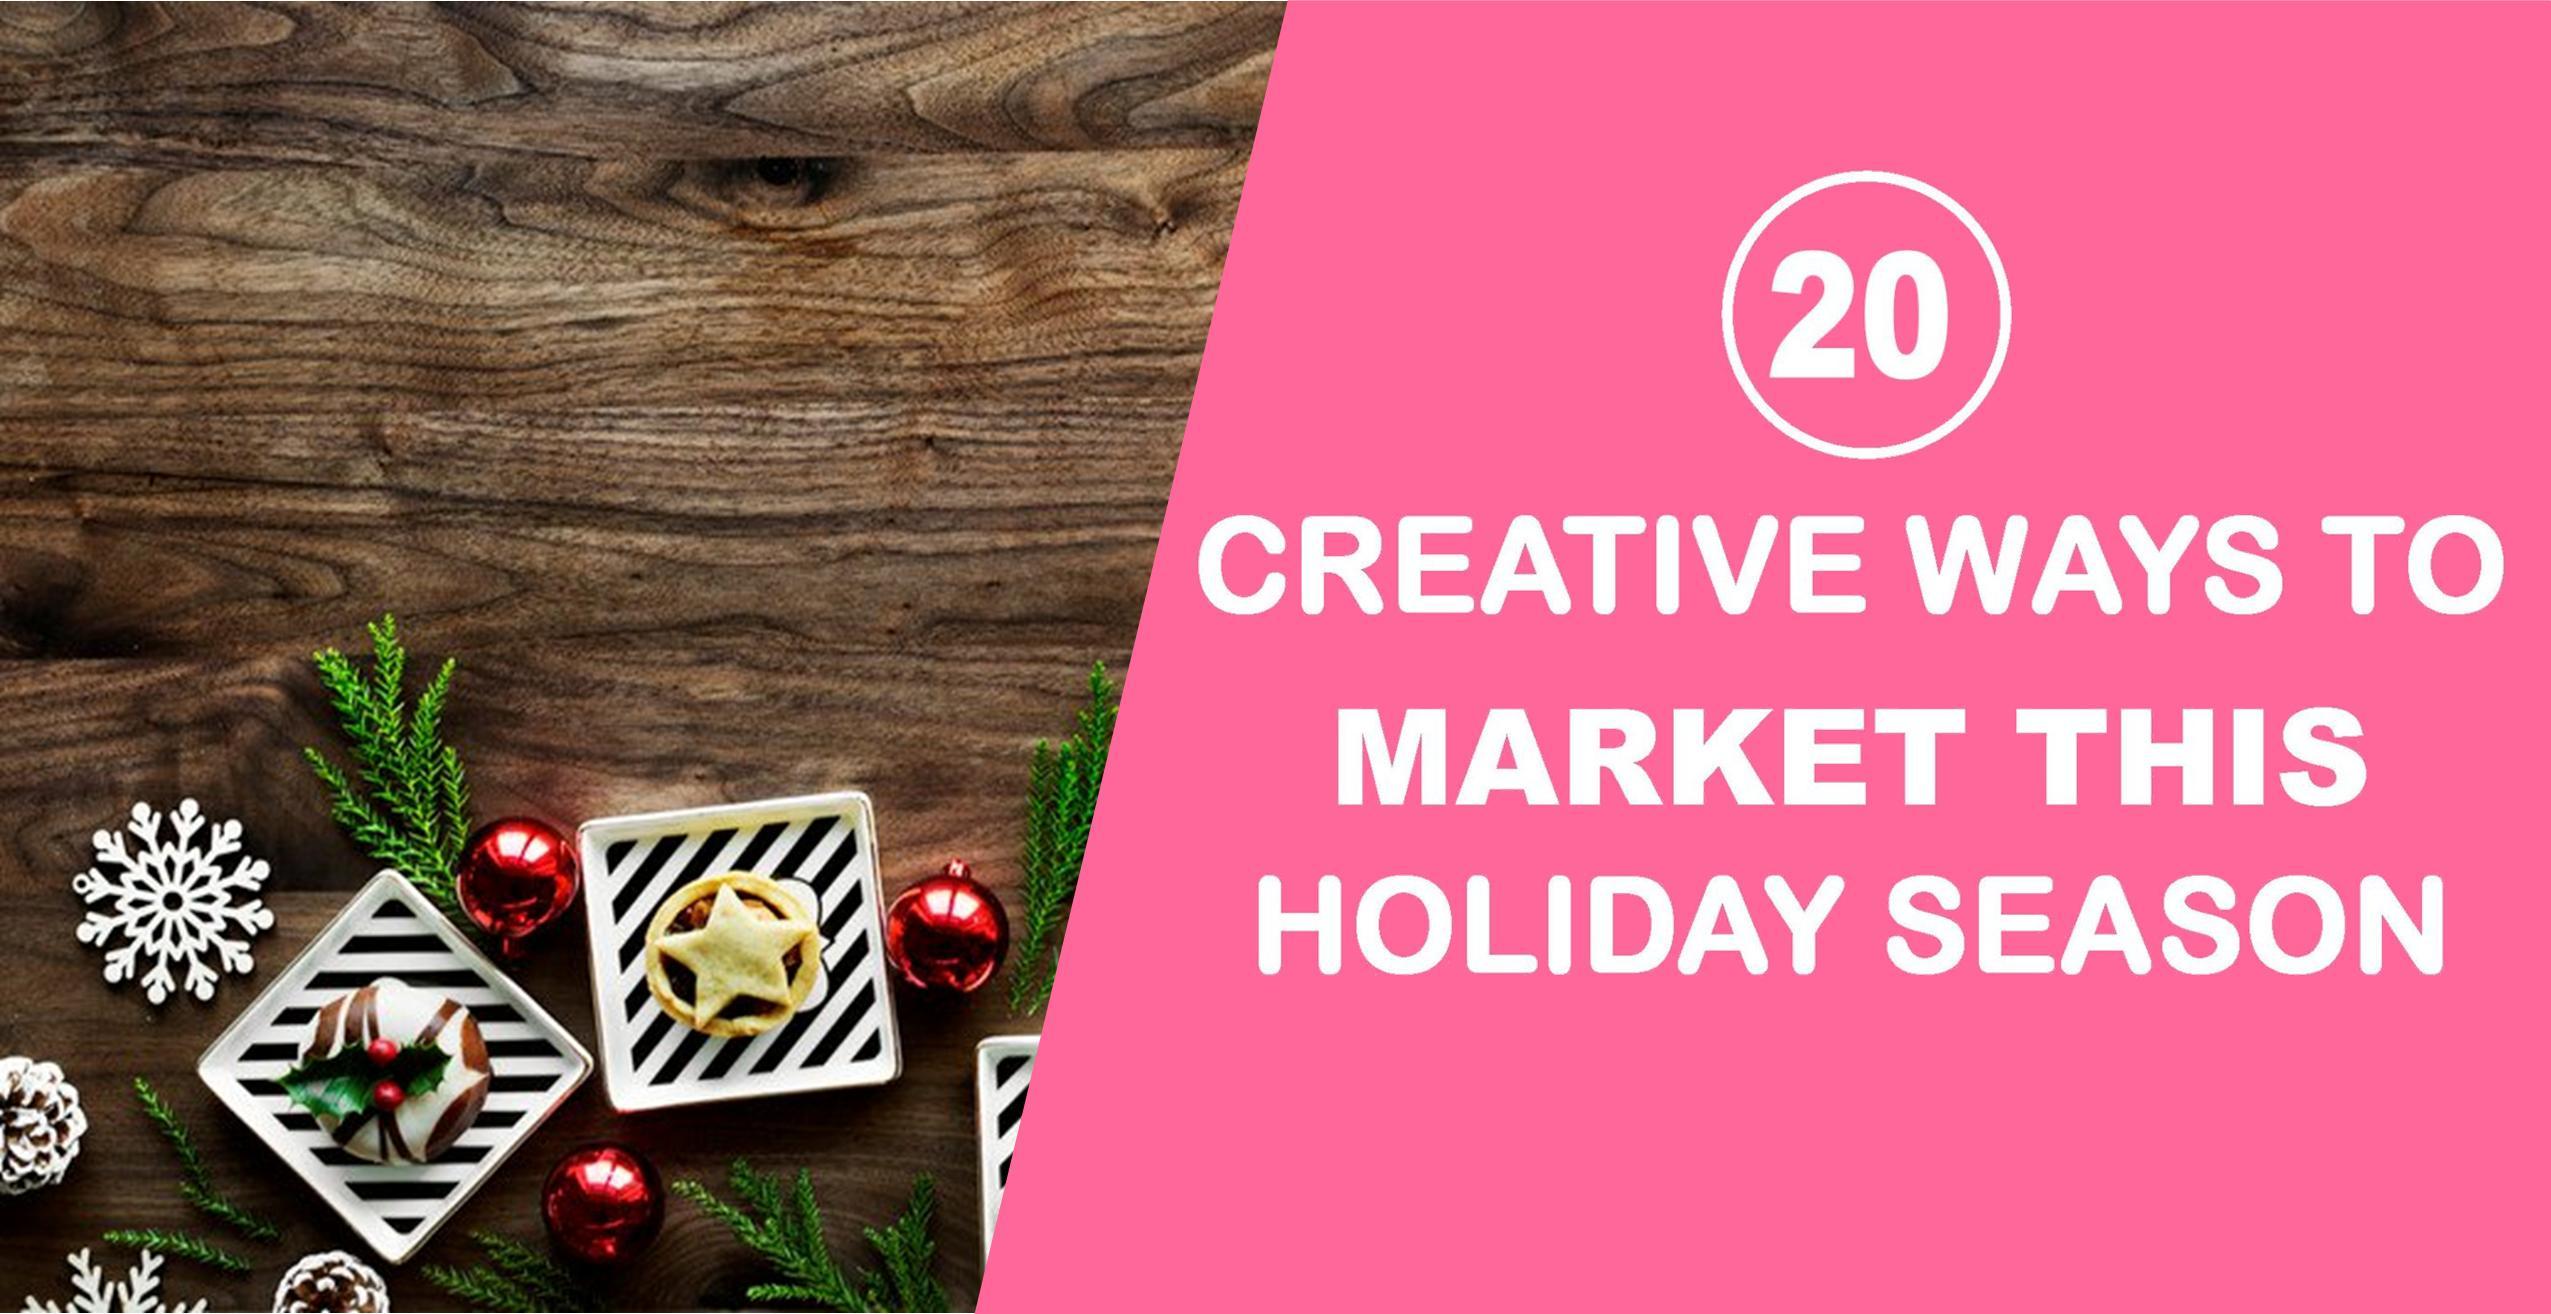 20 Creative Ways to Market This Holiday Season